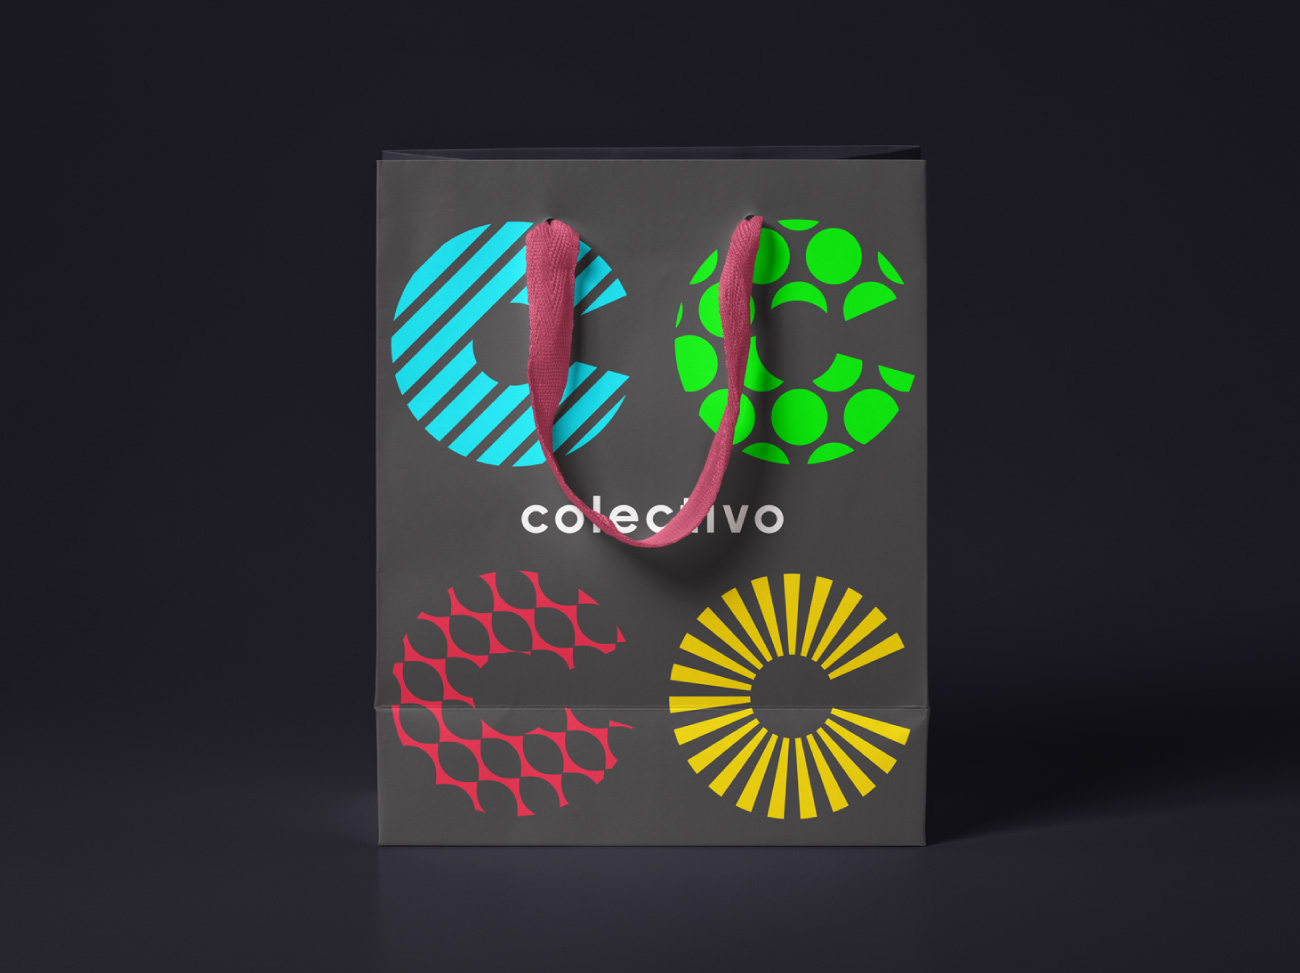 COLECTIVO6